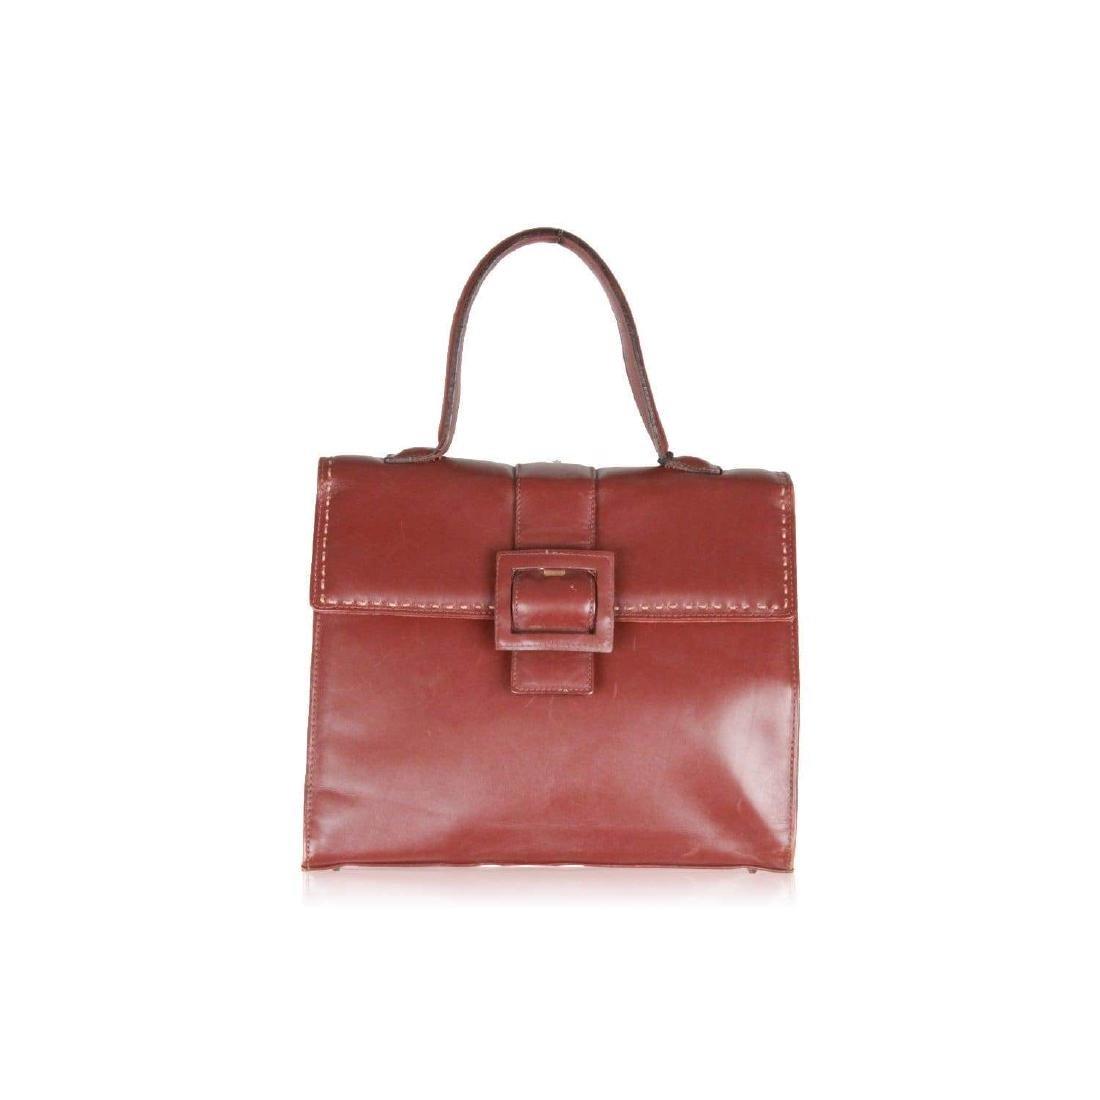 MONTENAPOLEONE Vintage Brown Leather HANDBAG